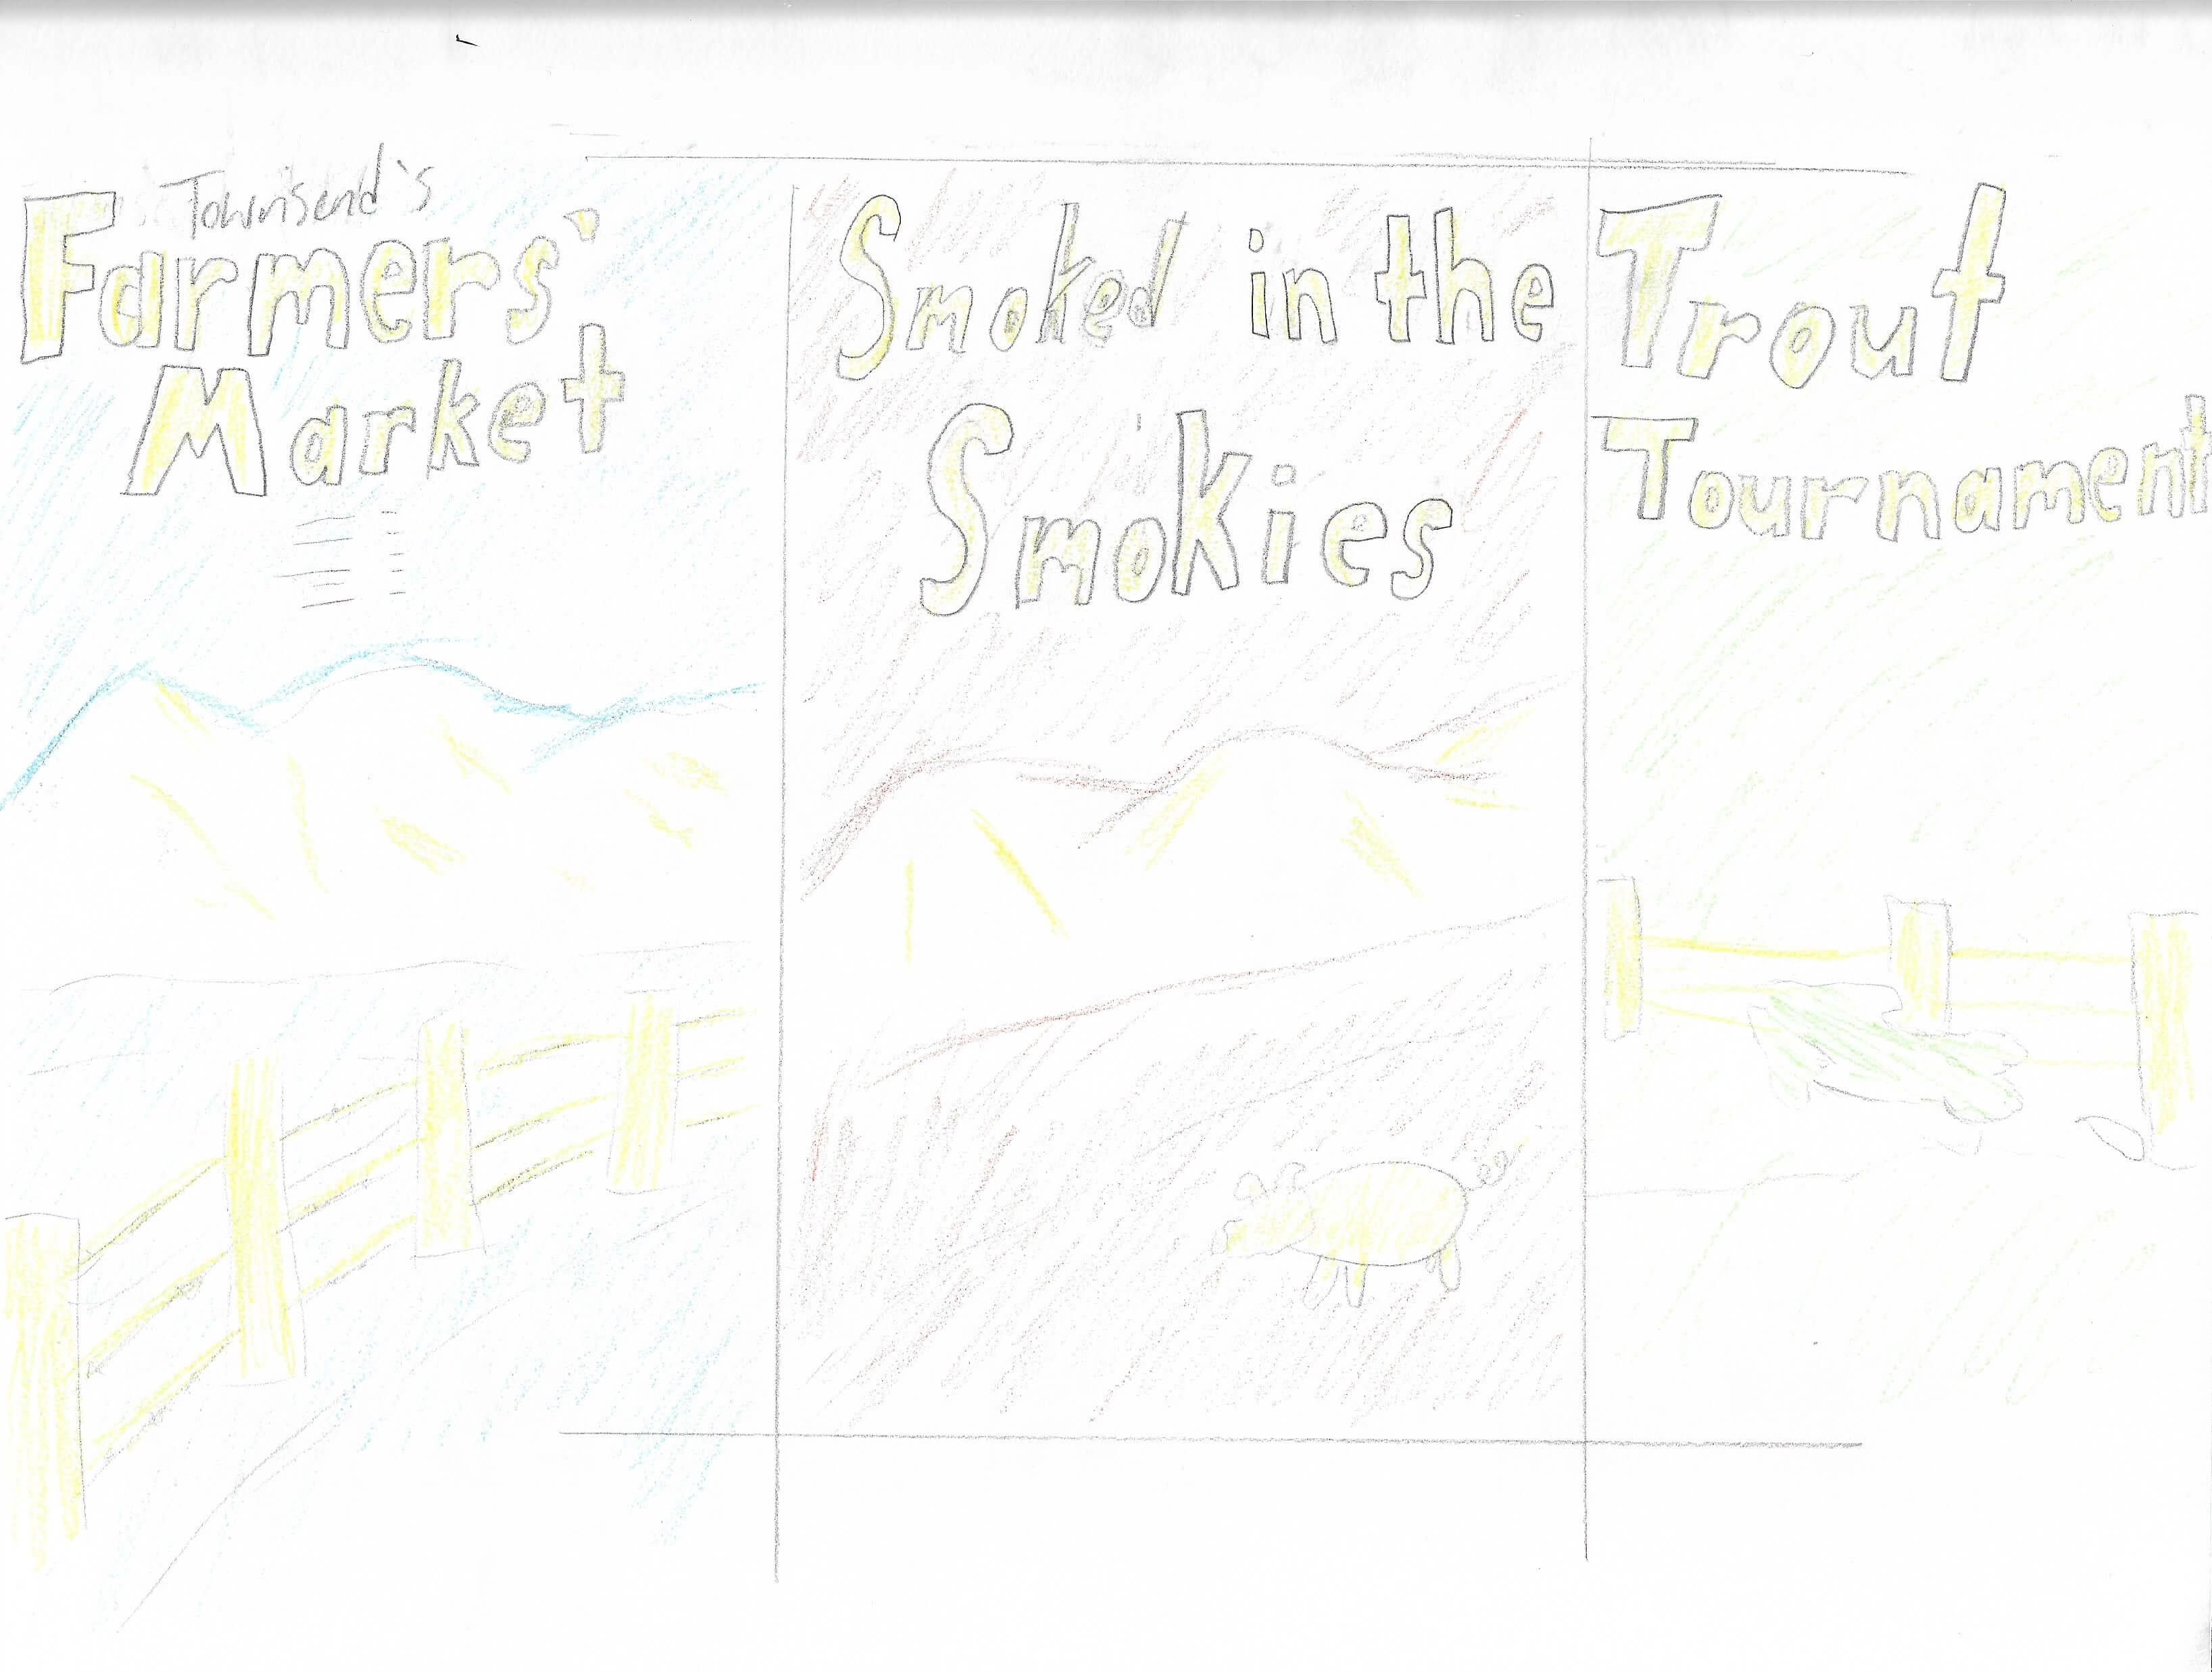 Townsend Farmers Market Poster Sketch | Toby Everett